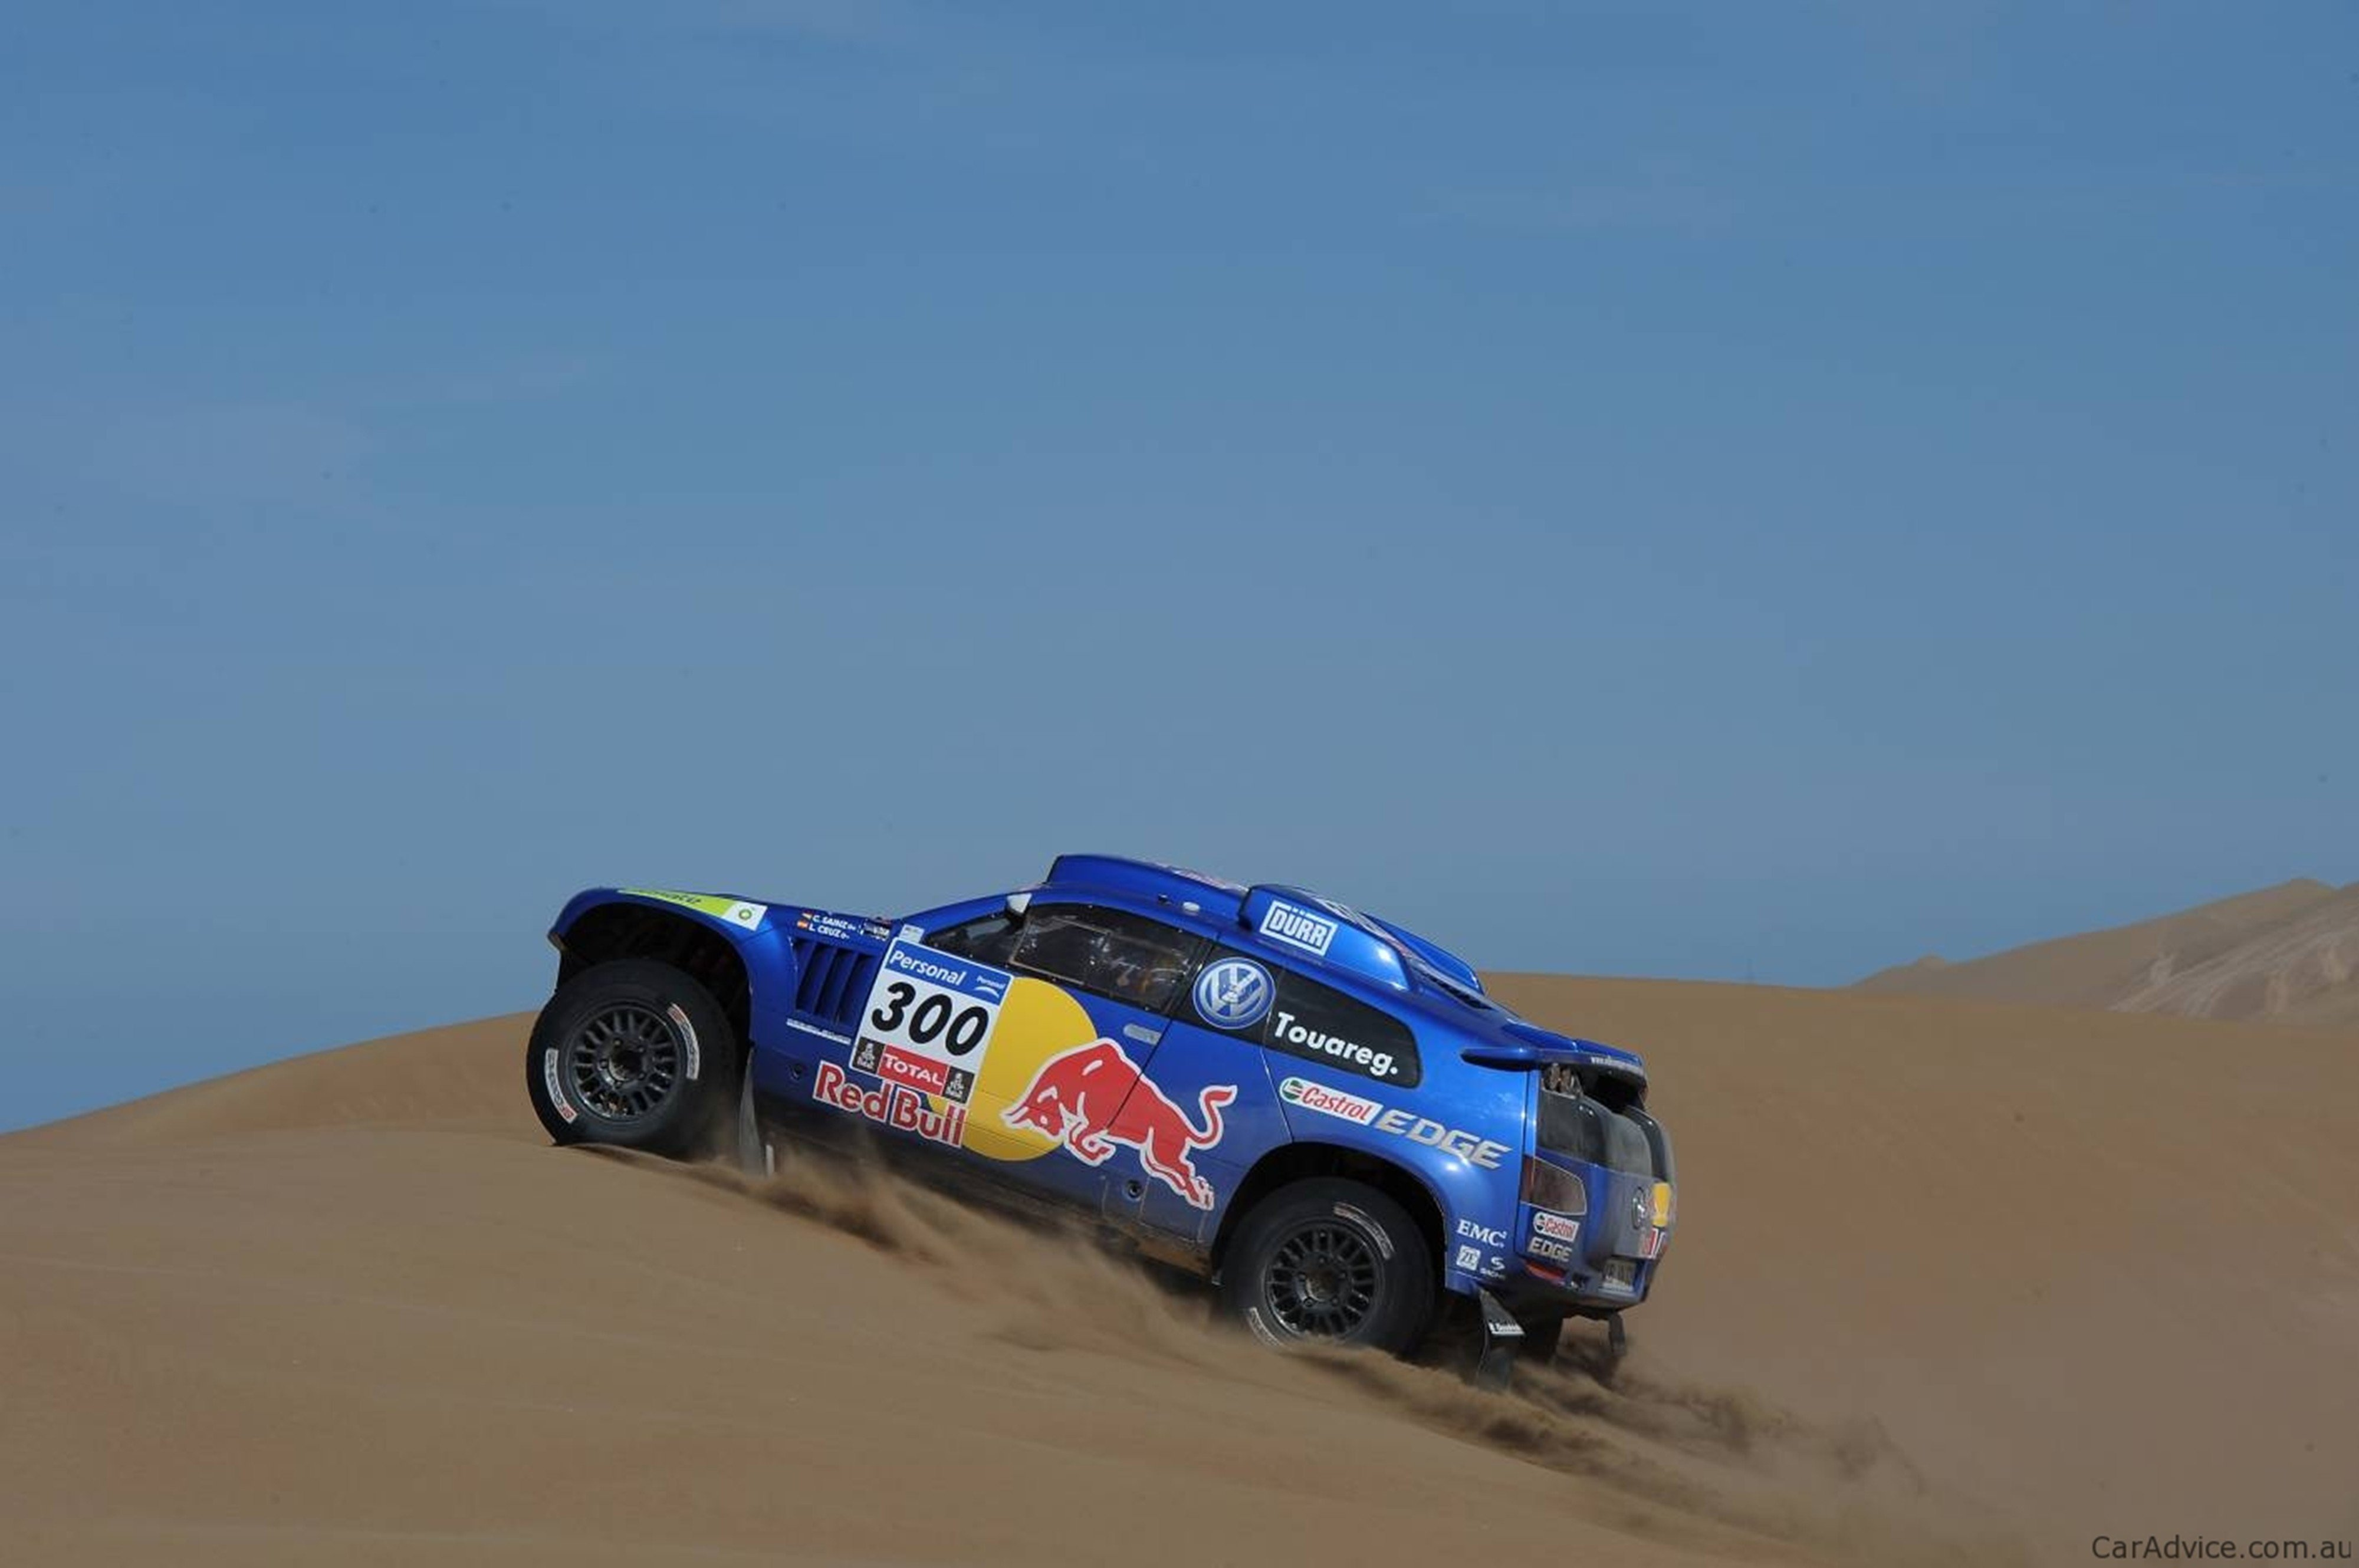 Car Racing in The Desert Racing Car Sand Desert